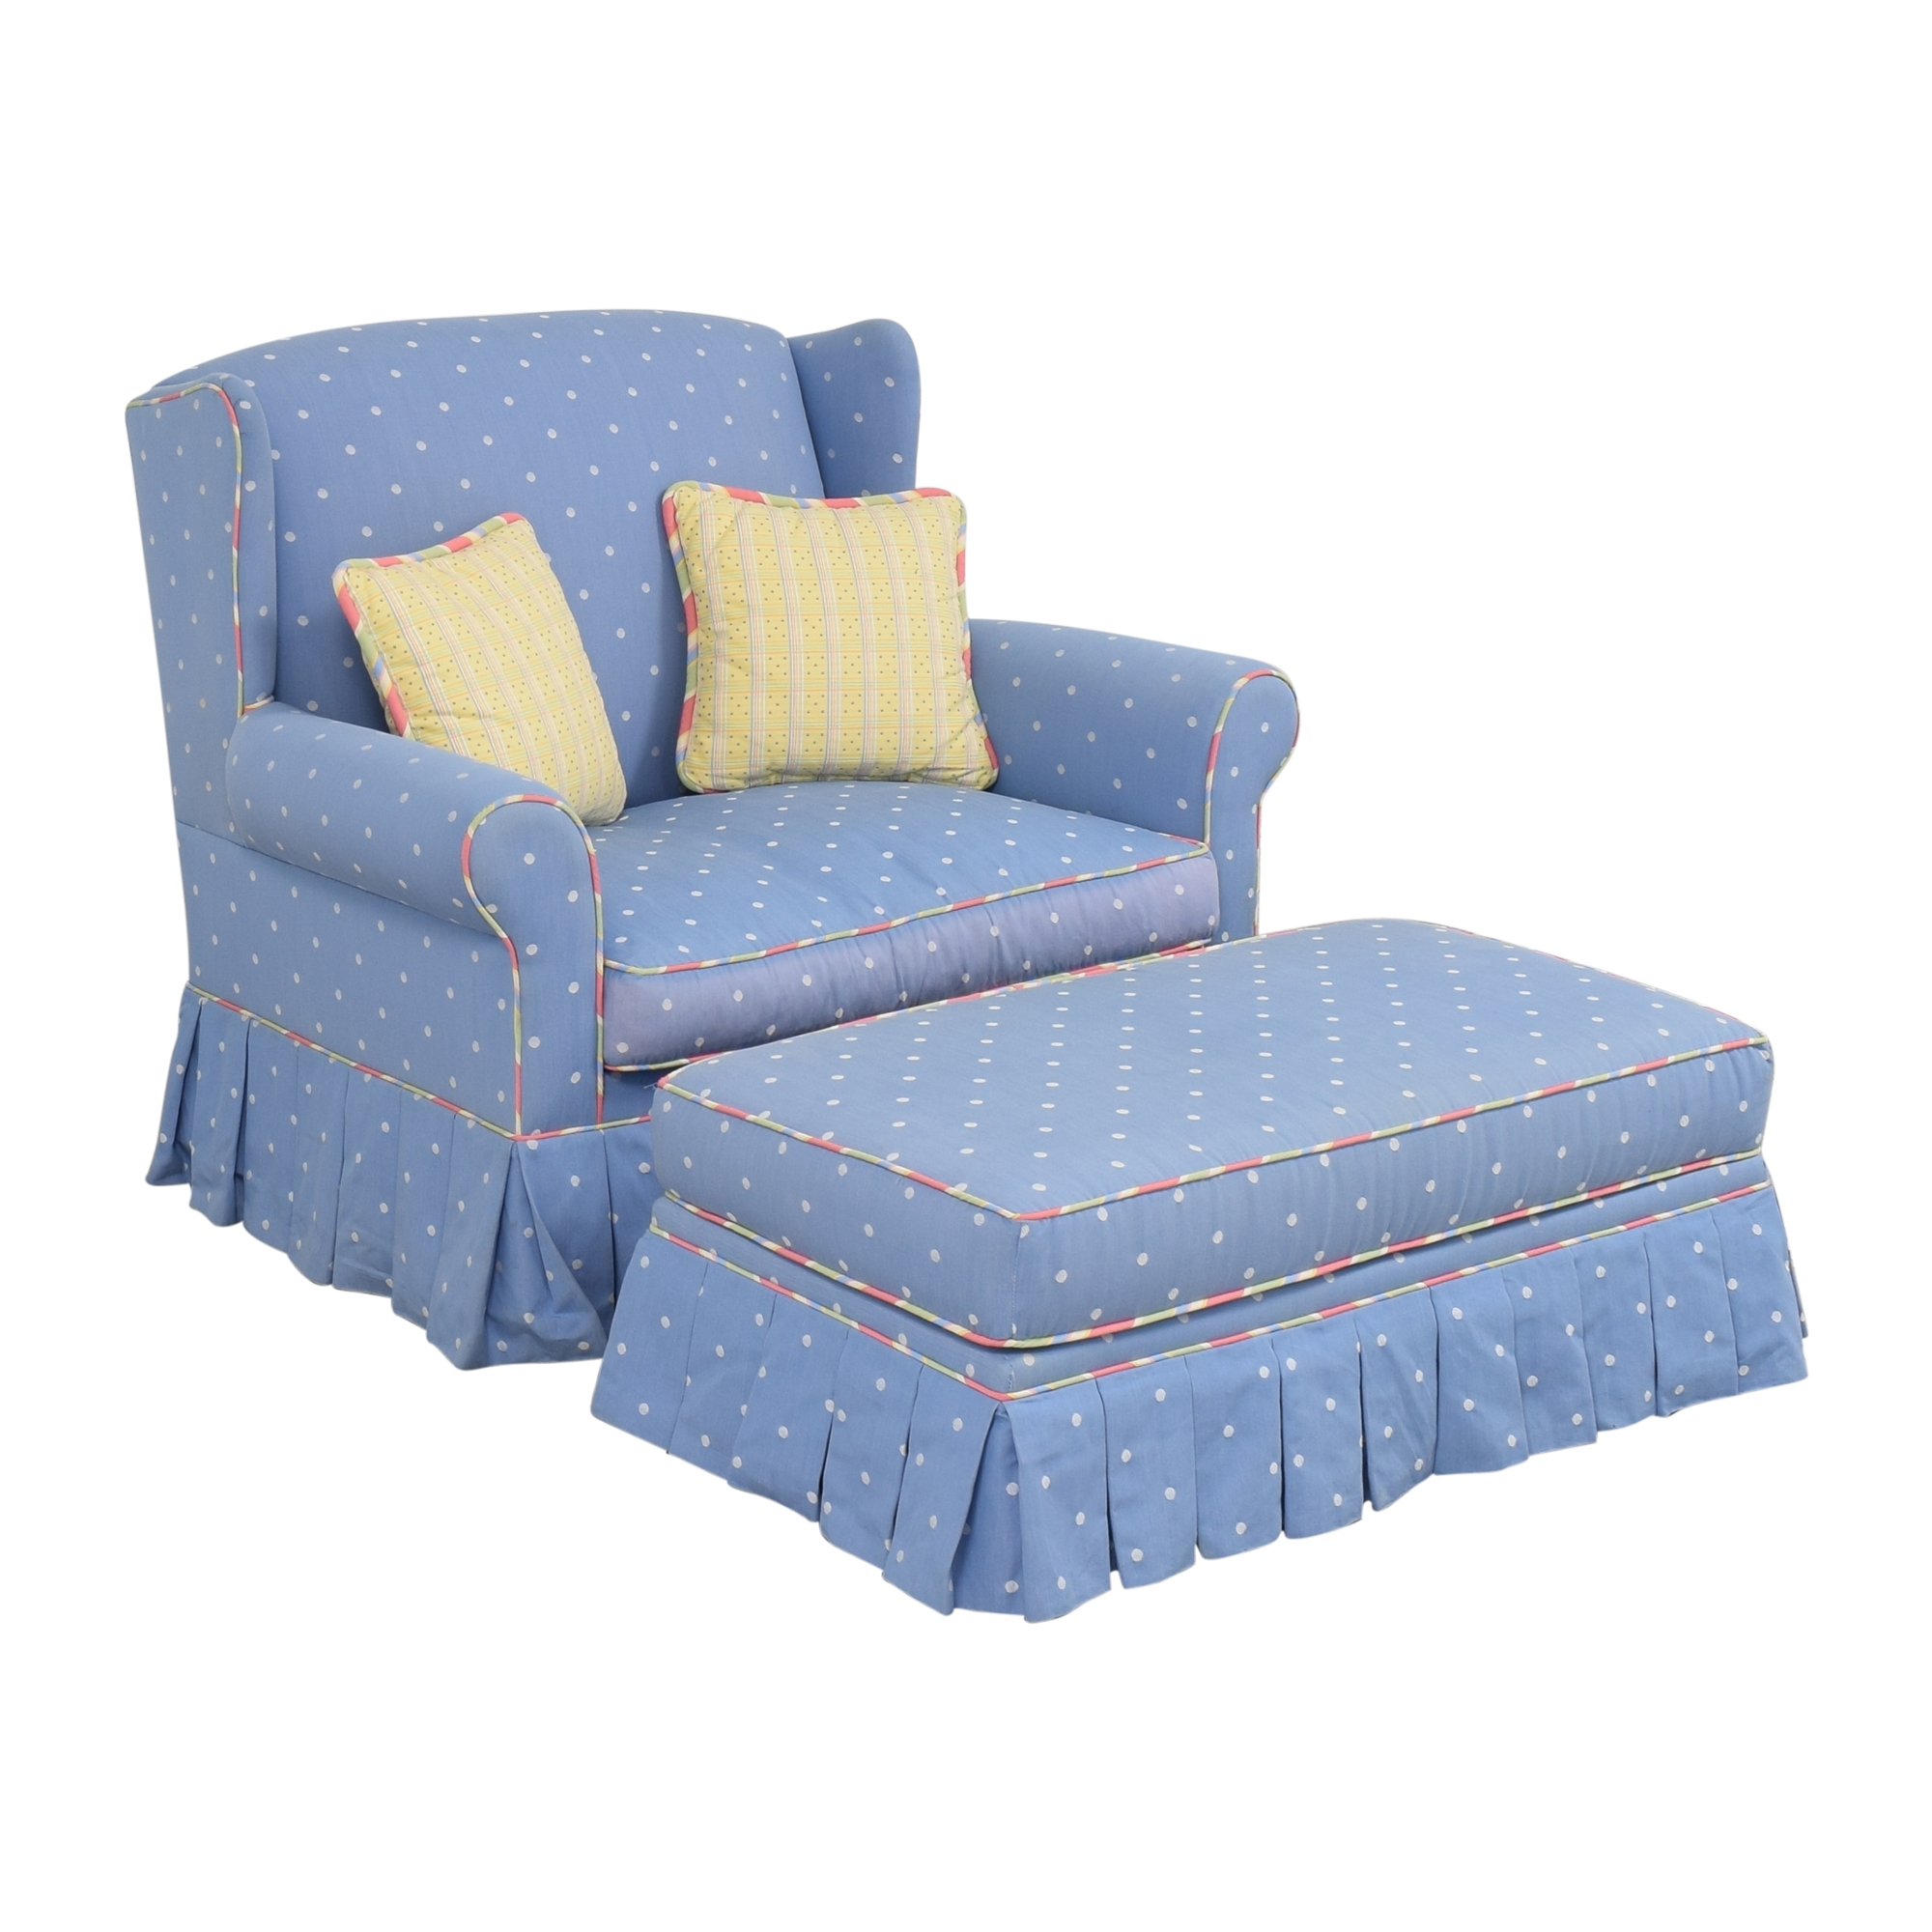 Ethan Allen Ethan Allen Glider with Ottoman Accent Chairs